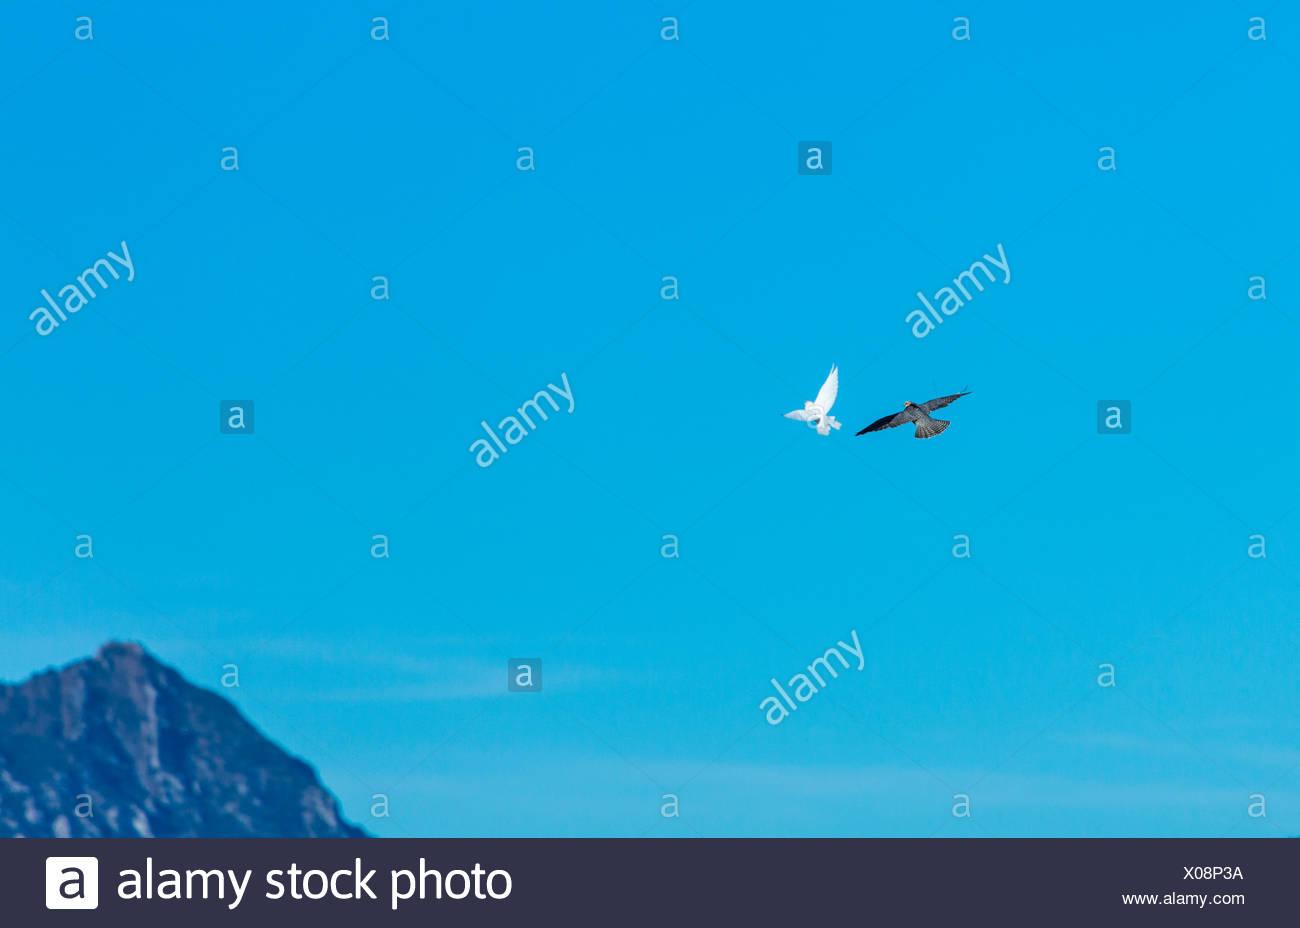 Raptors in flight - Burgos Spain - Stock Image